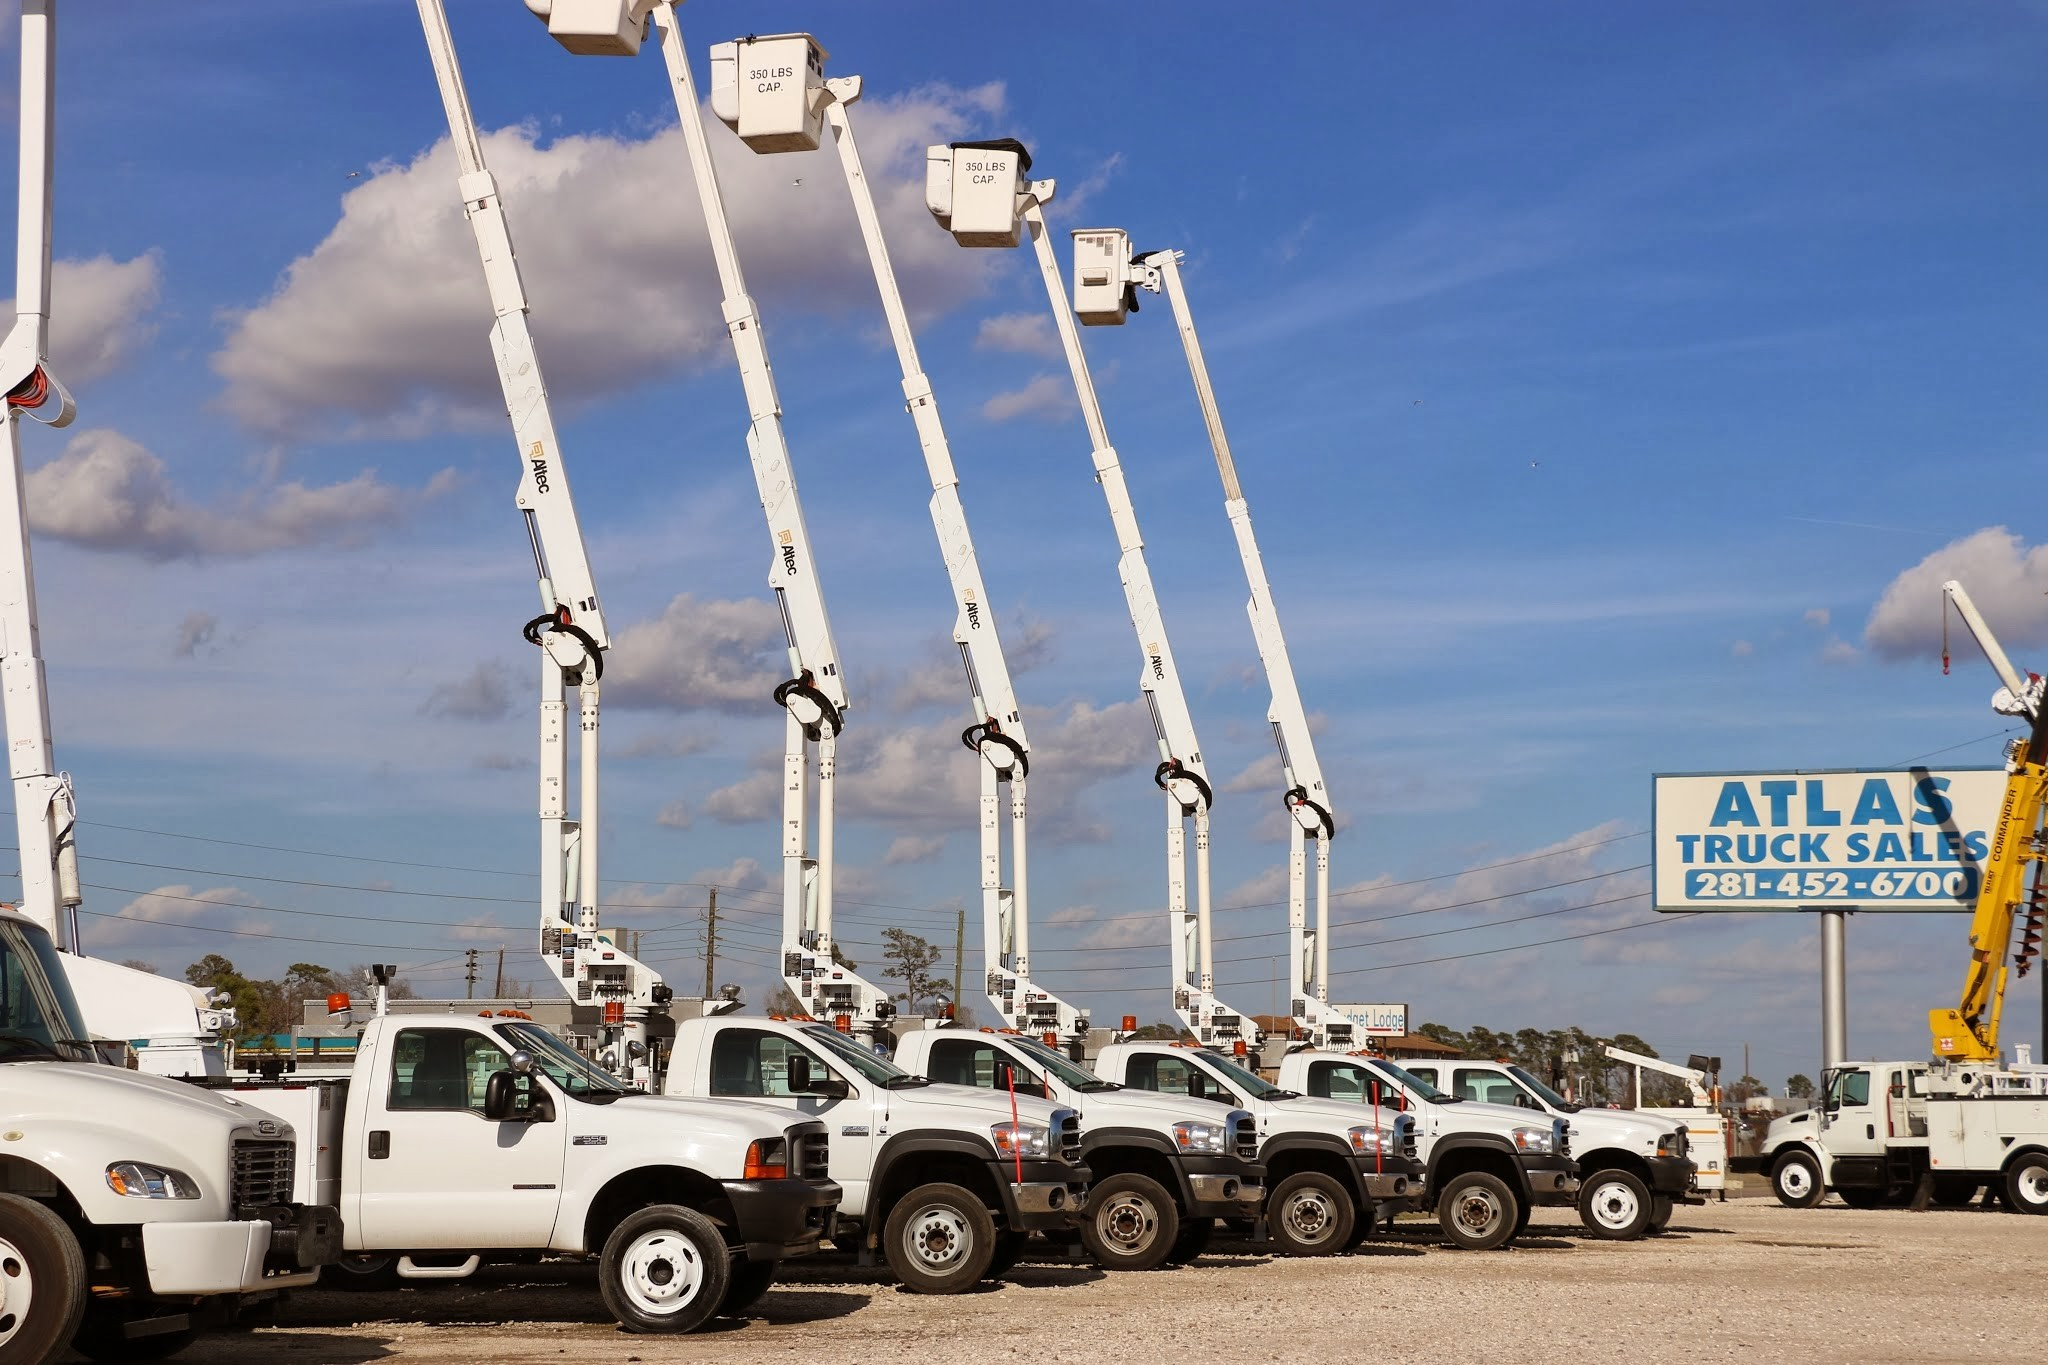 Atlas Truck Sales >> Atlas Truck Sales Inc Linkedin